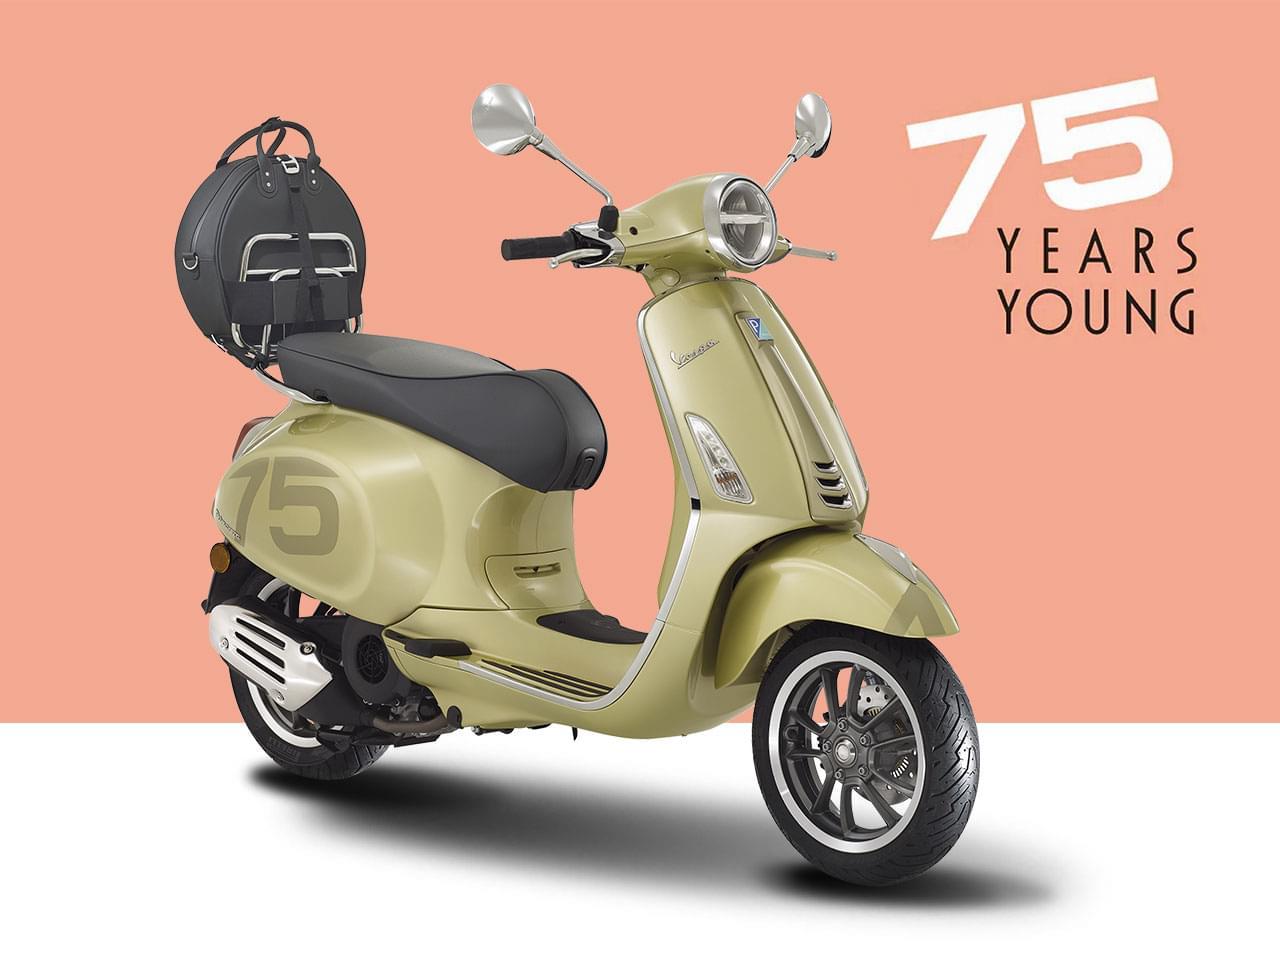 Vespa Primavera 75th S 50 4T 3V i-get